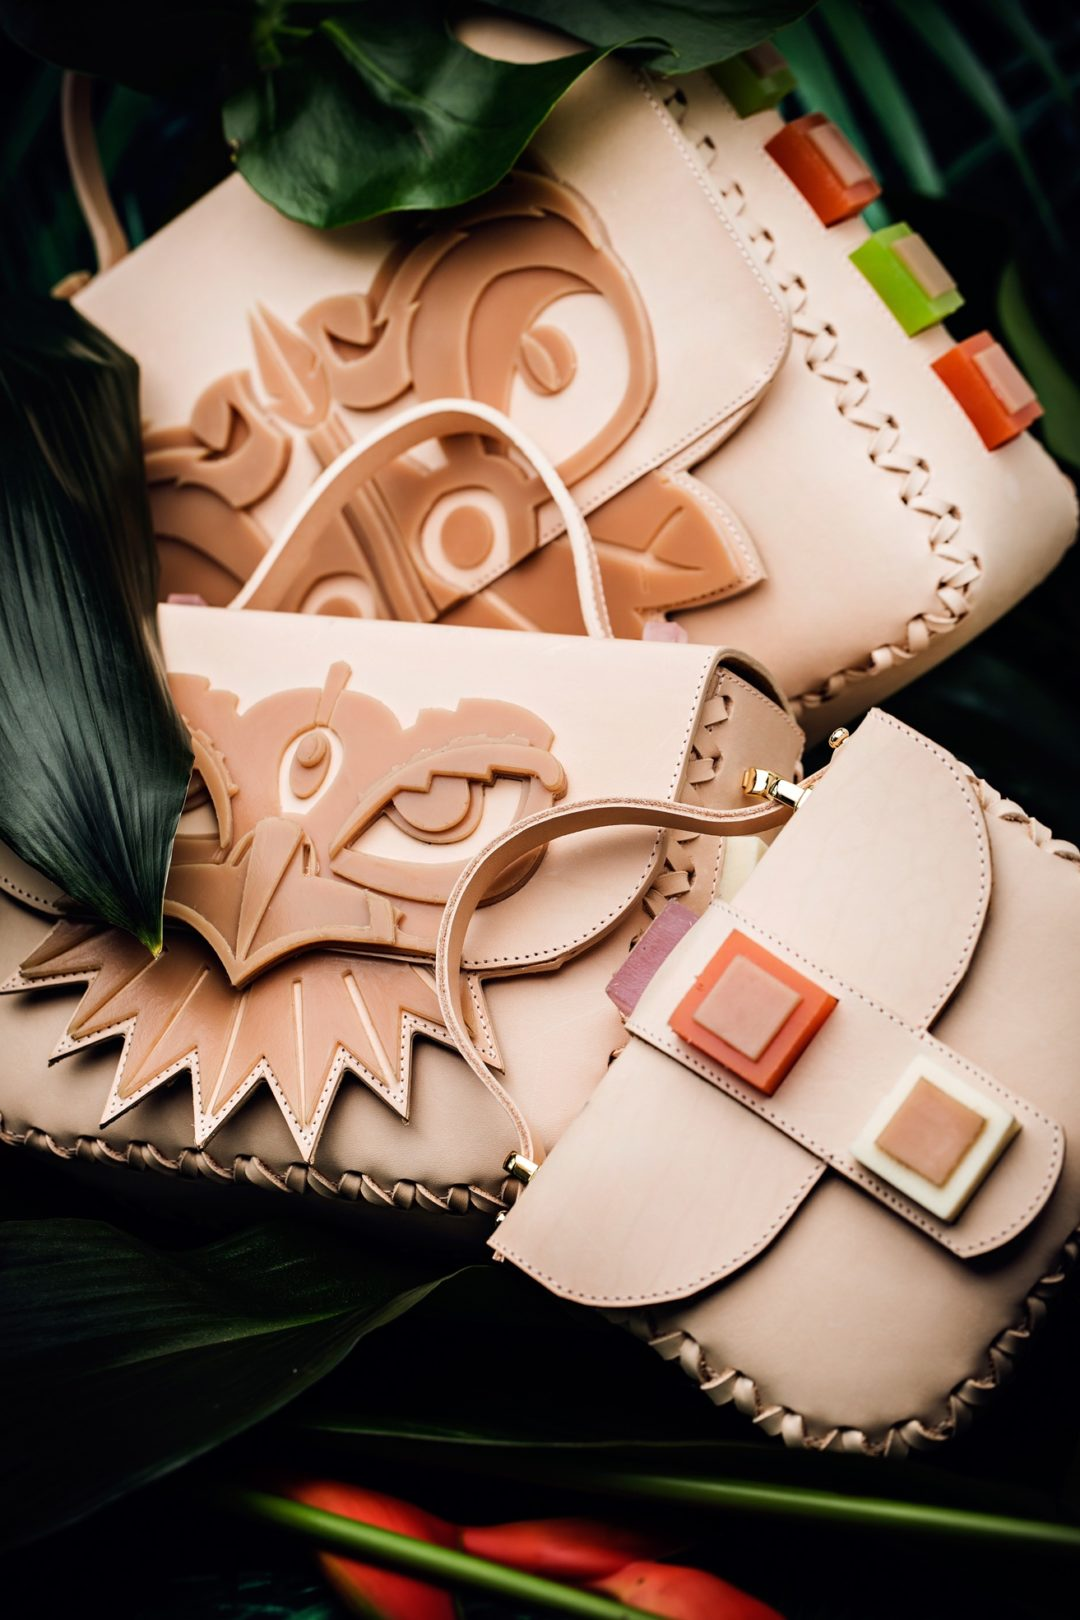 Leather bags collection Gods of Teótihuacán by Nadine Eismann, photographer Christian Metzler